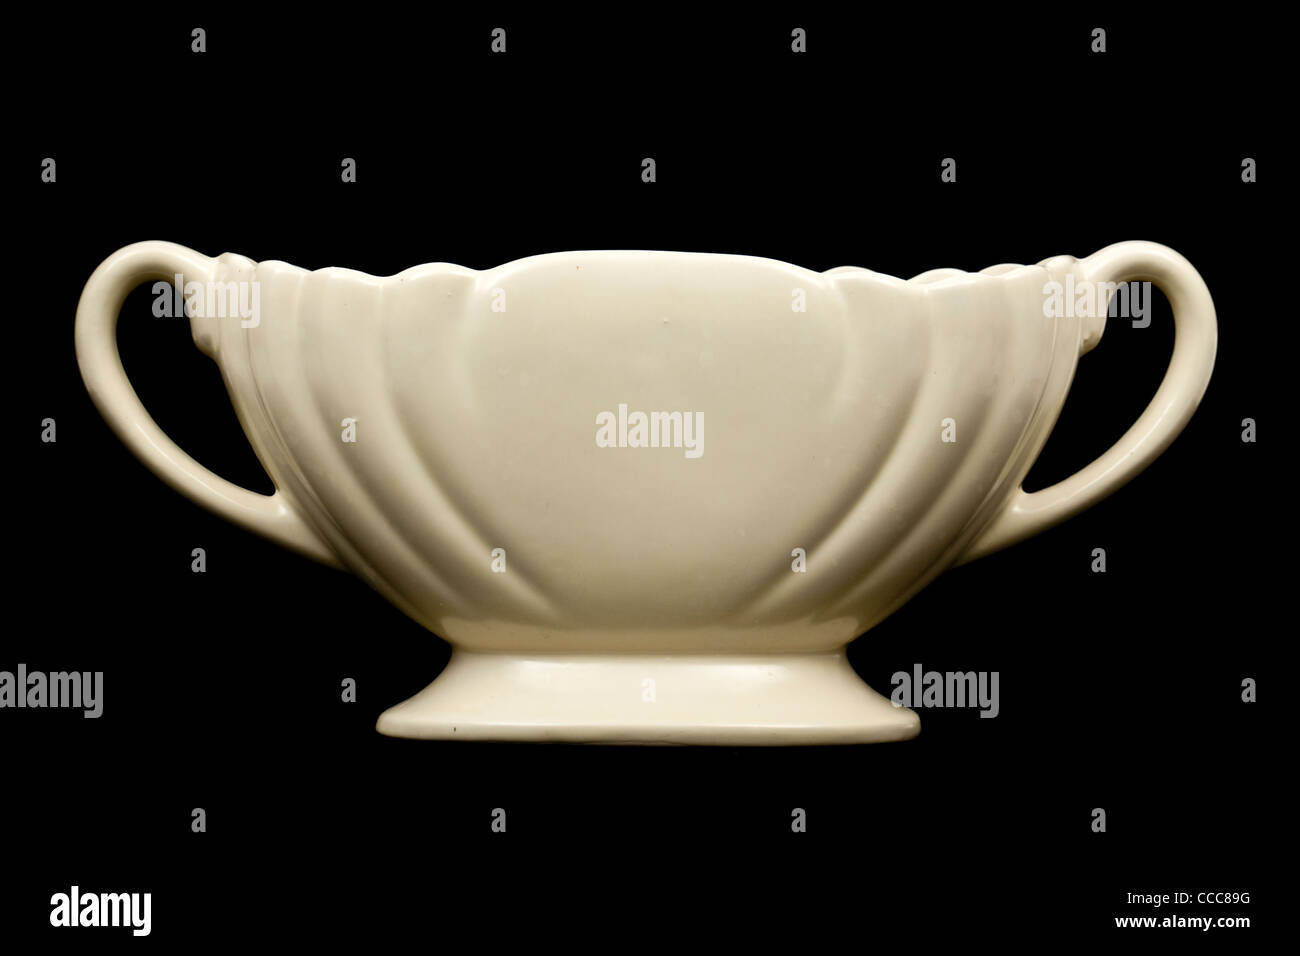 Vintage cream posy bowl vase by dartmouth pottery devon vintage cream posy bowl vase by dartmouth pottery devon pattern 137b reviewsmspy